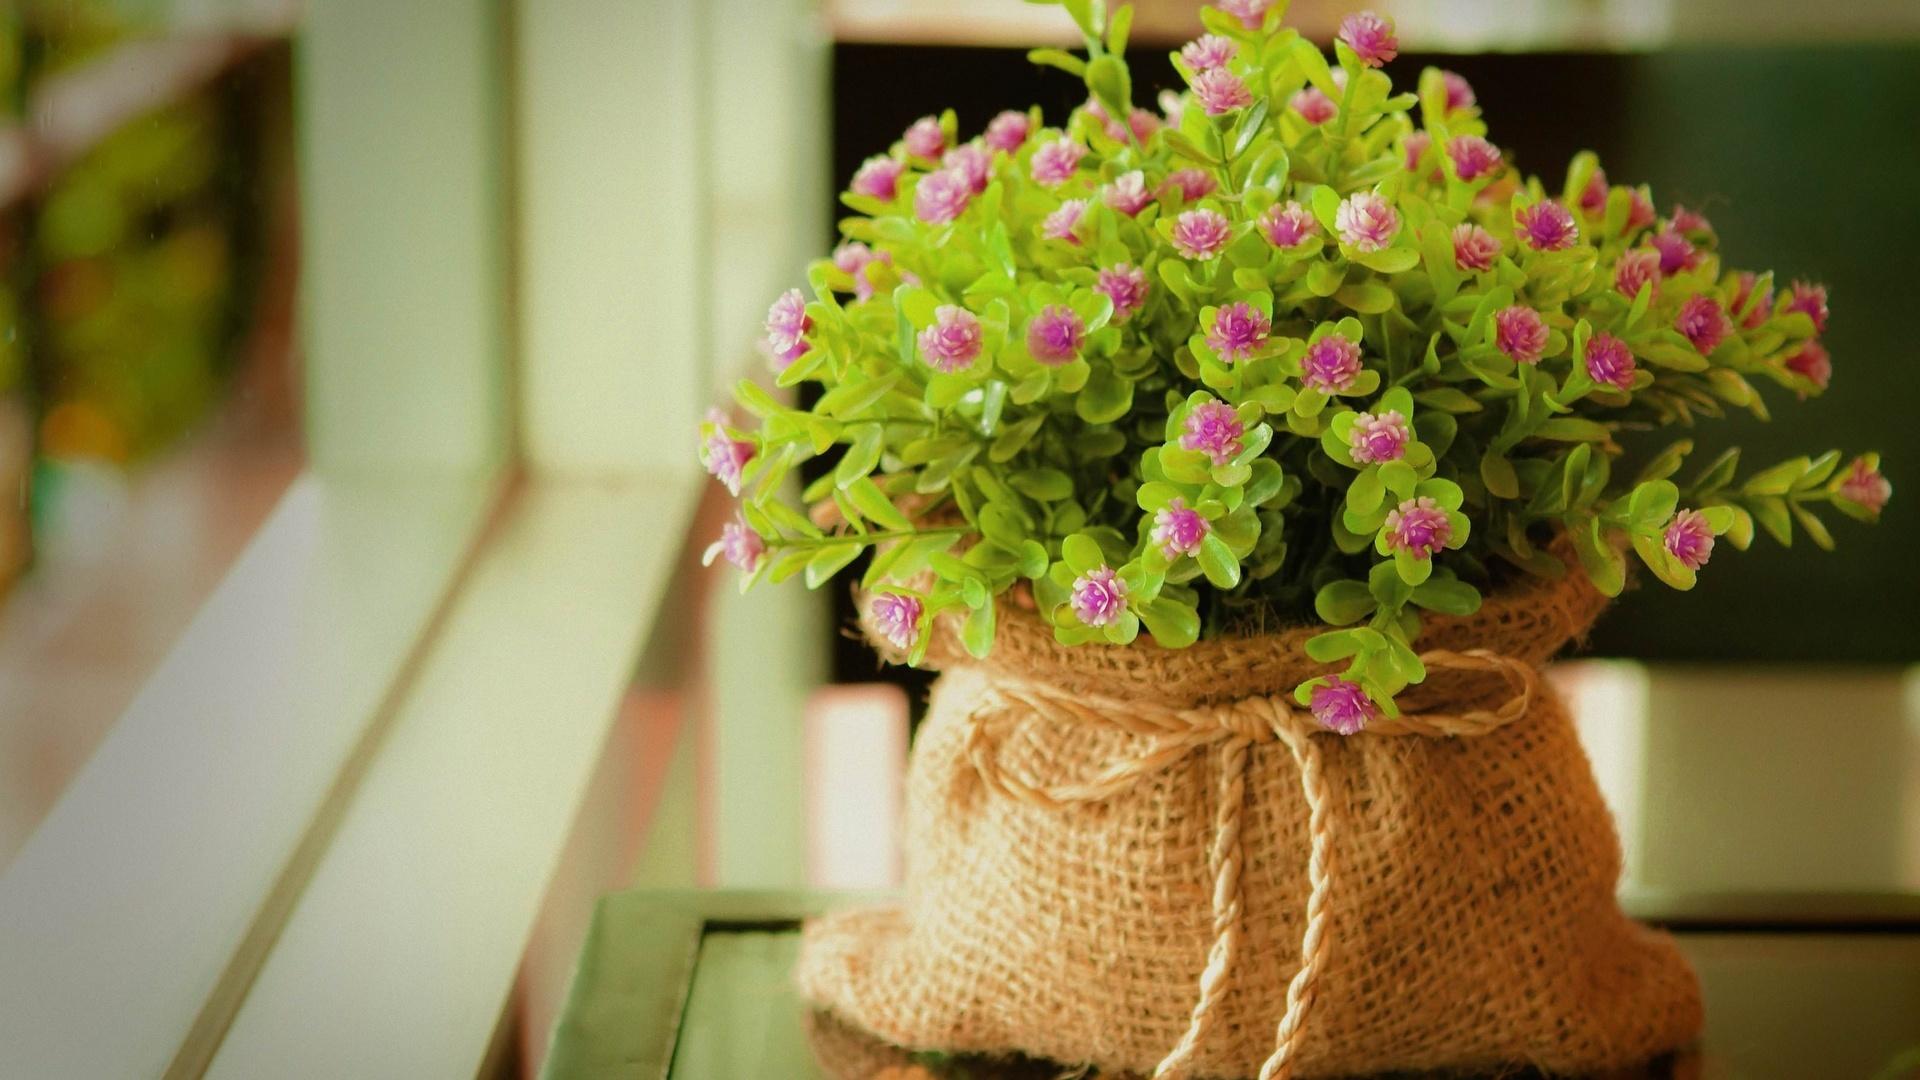 Houseplants desktop wallpaper free download